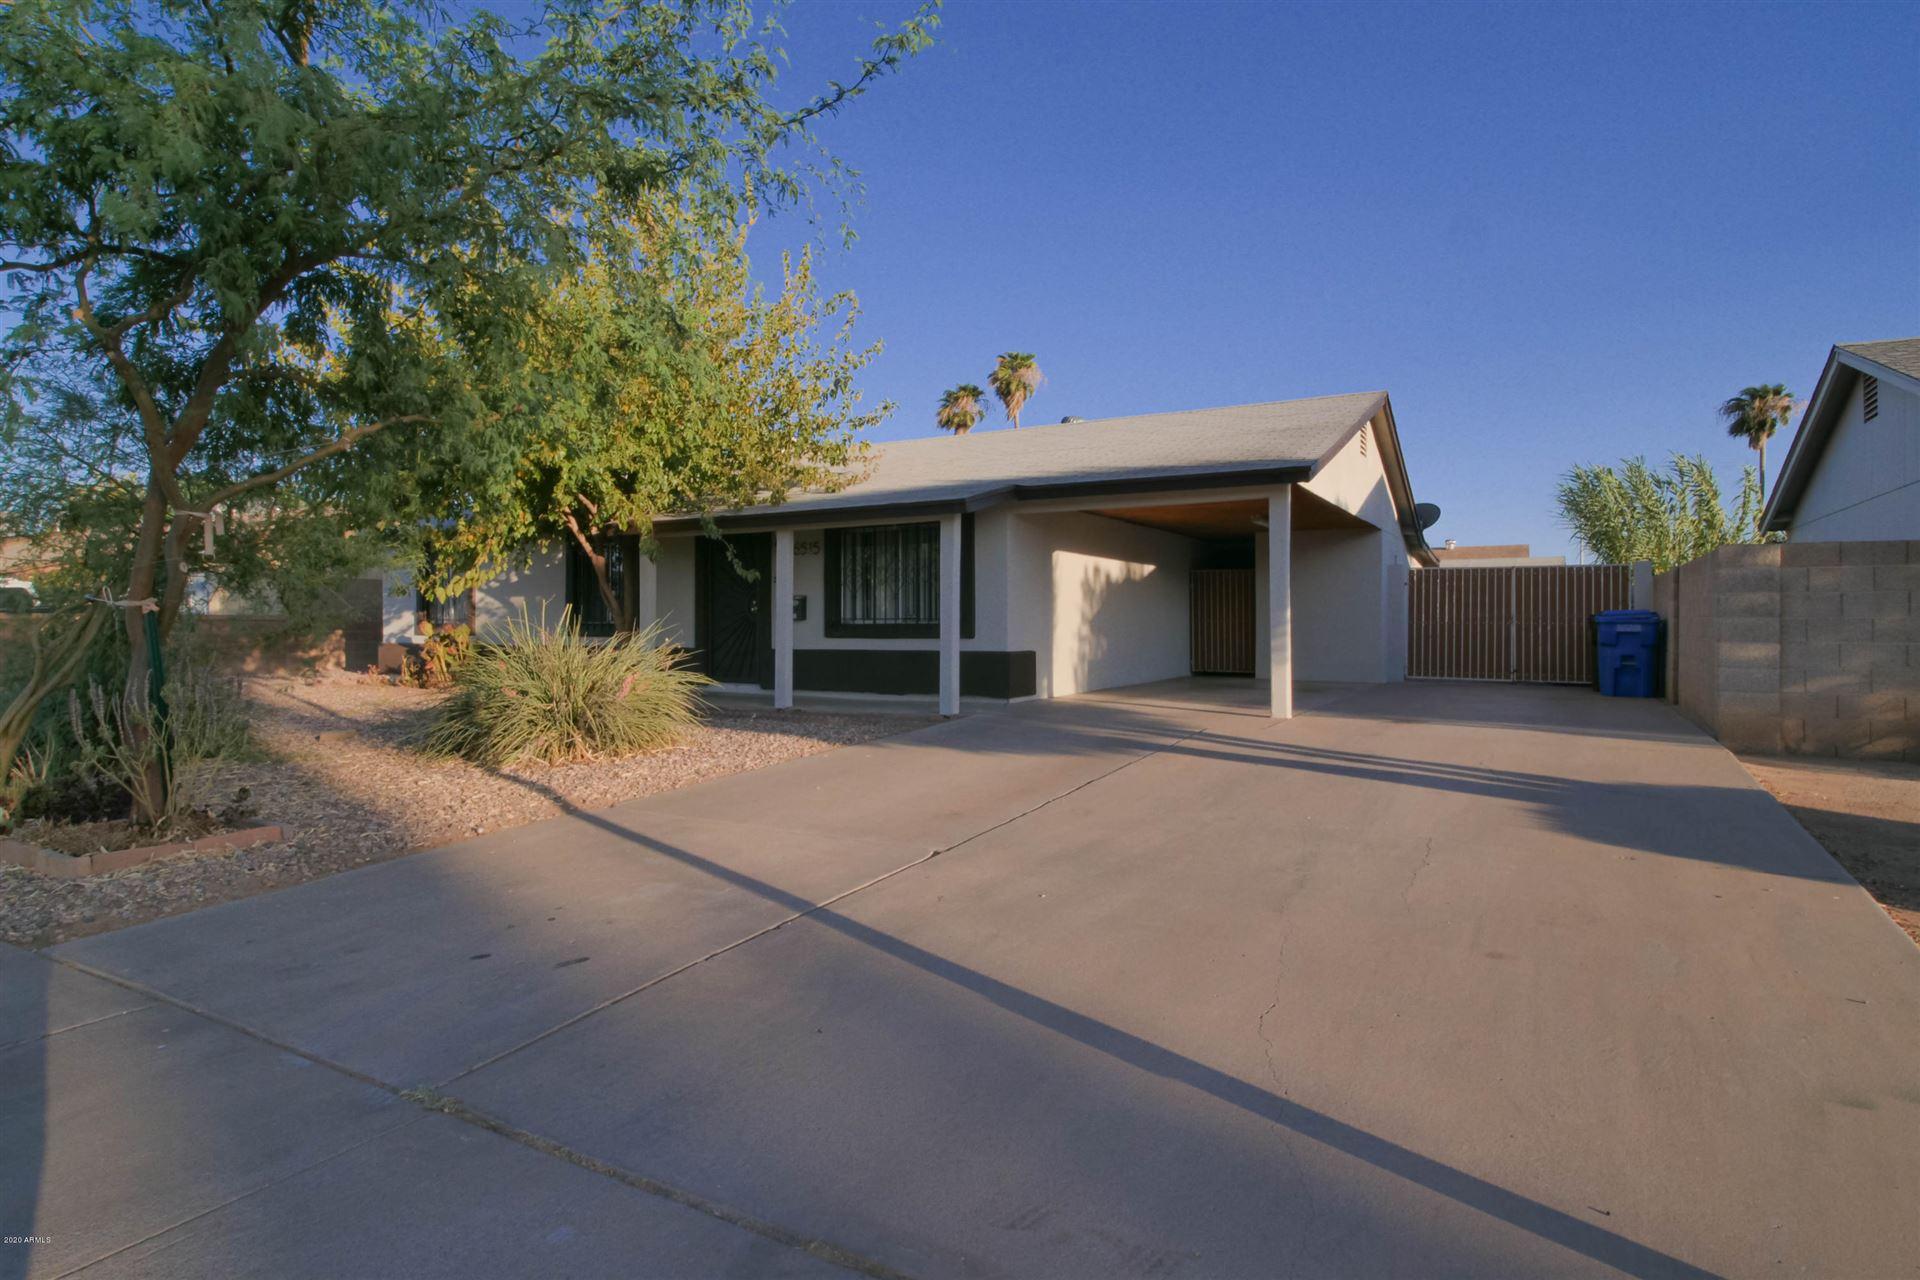 Property Image Of 6515 W Holly Street In Phoenix, Az